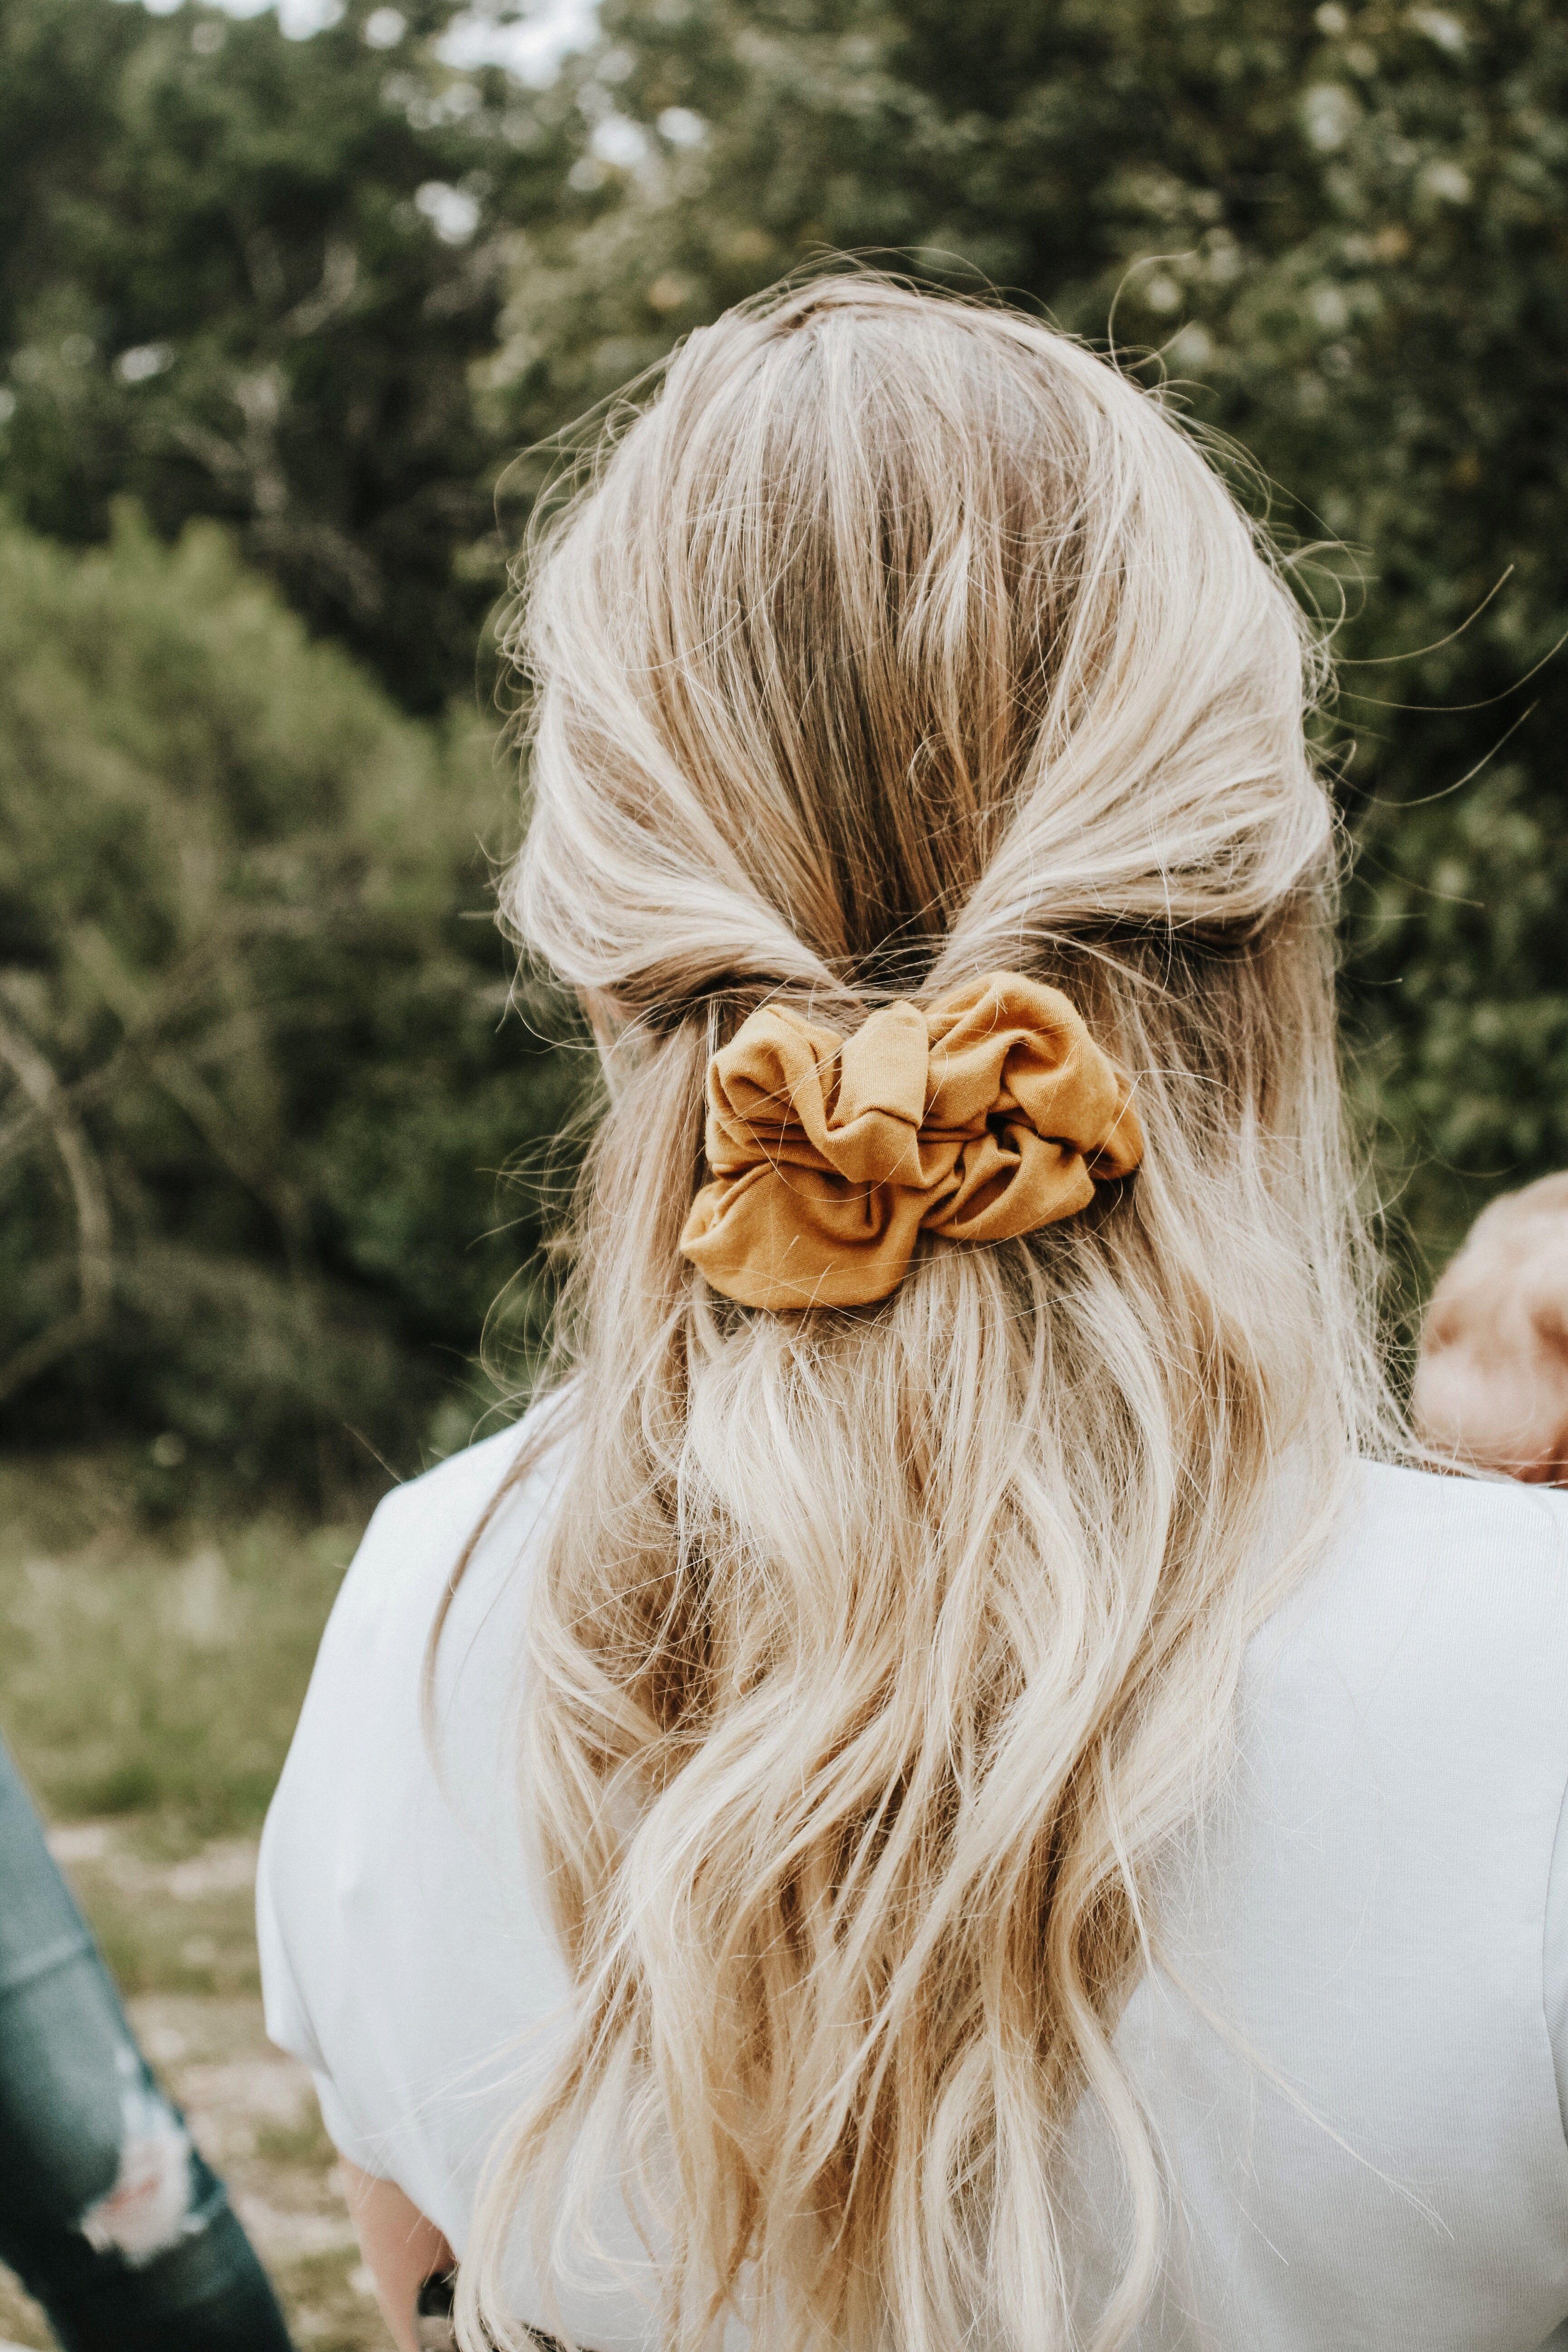 15 Scrunchie Hairstyles - How To Wear a Scrunchie, scrunchie bun, scrunchies, scrunchie hairstyles curly hair,how to use a scrunchie to make a bun #hairscrunchie